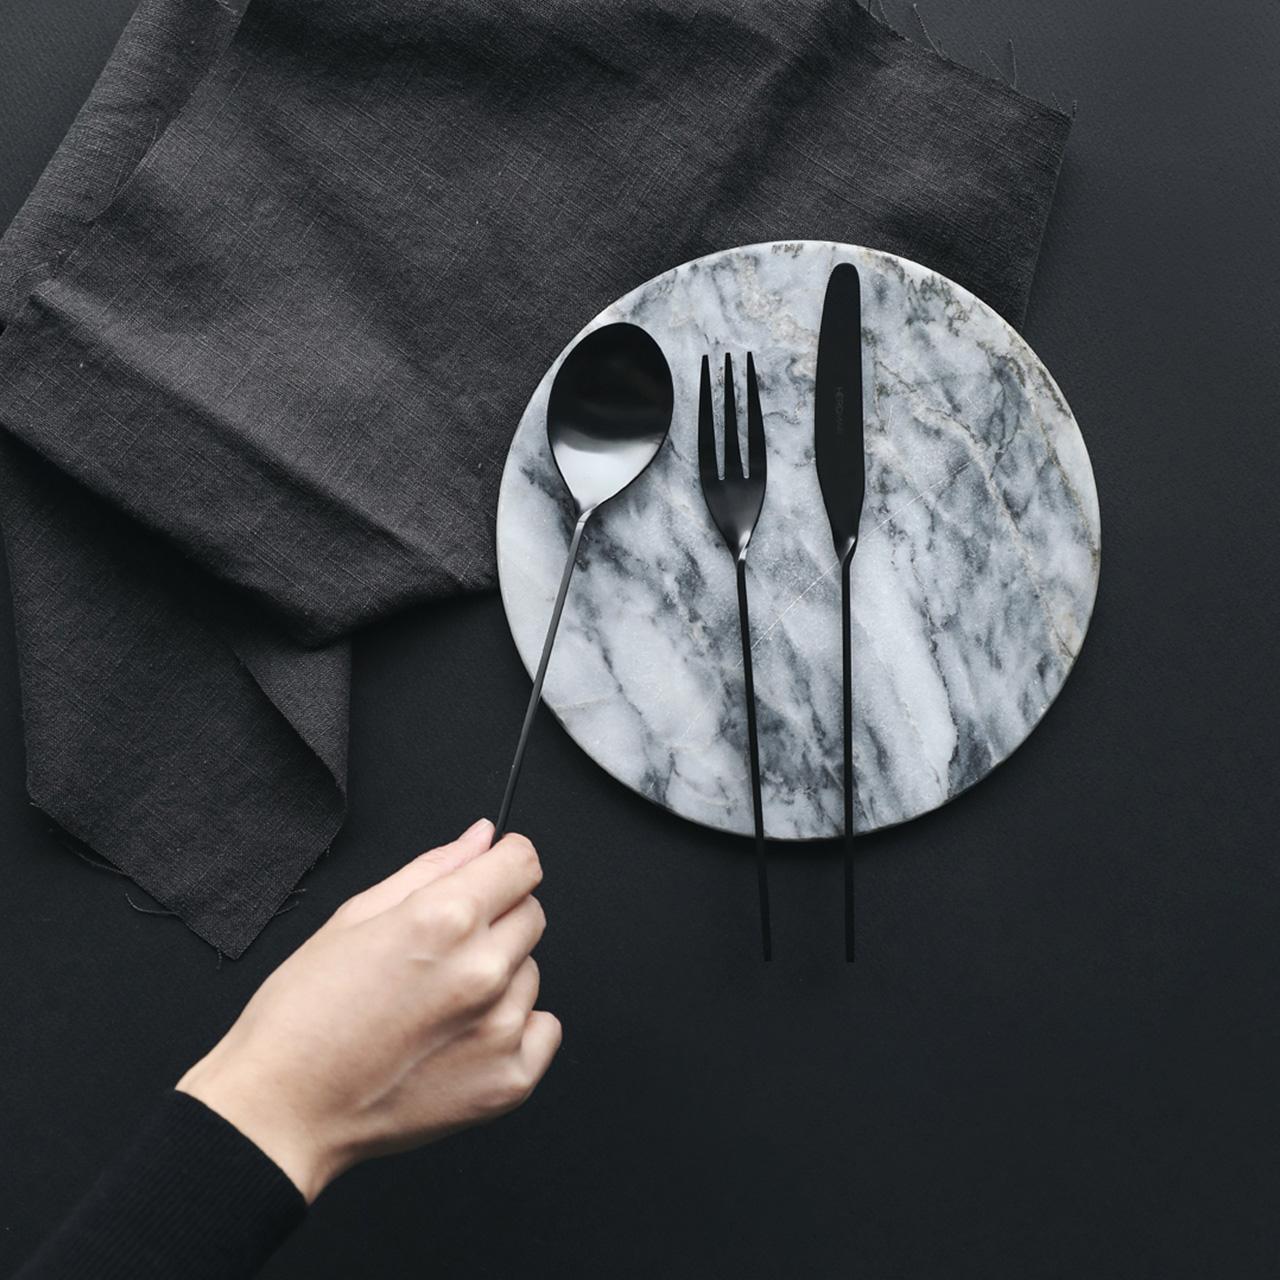 Malmo_Cutlery - DESIGN BY MIGUEL SOEIRO